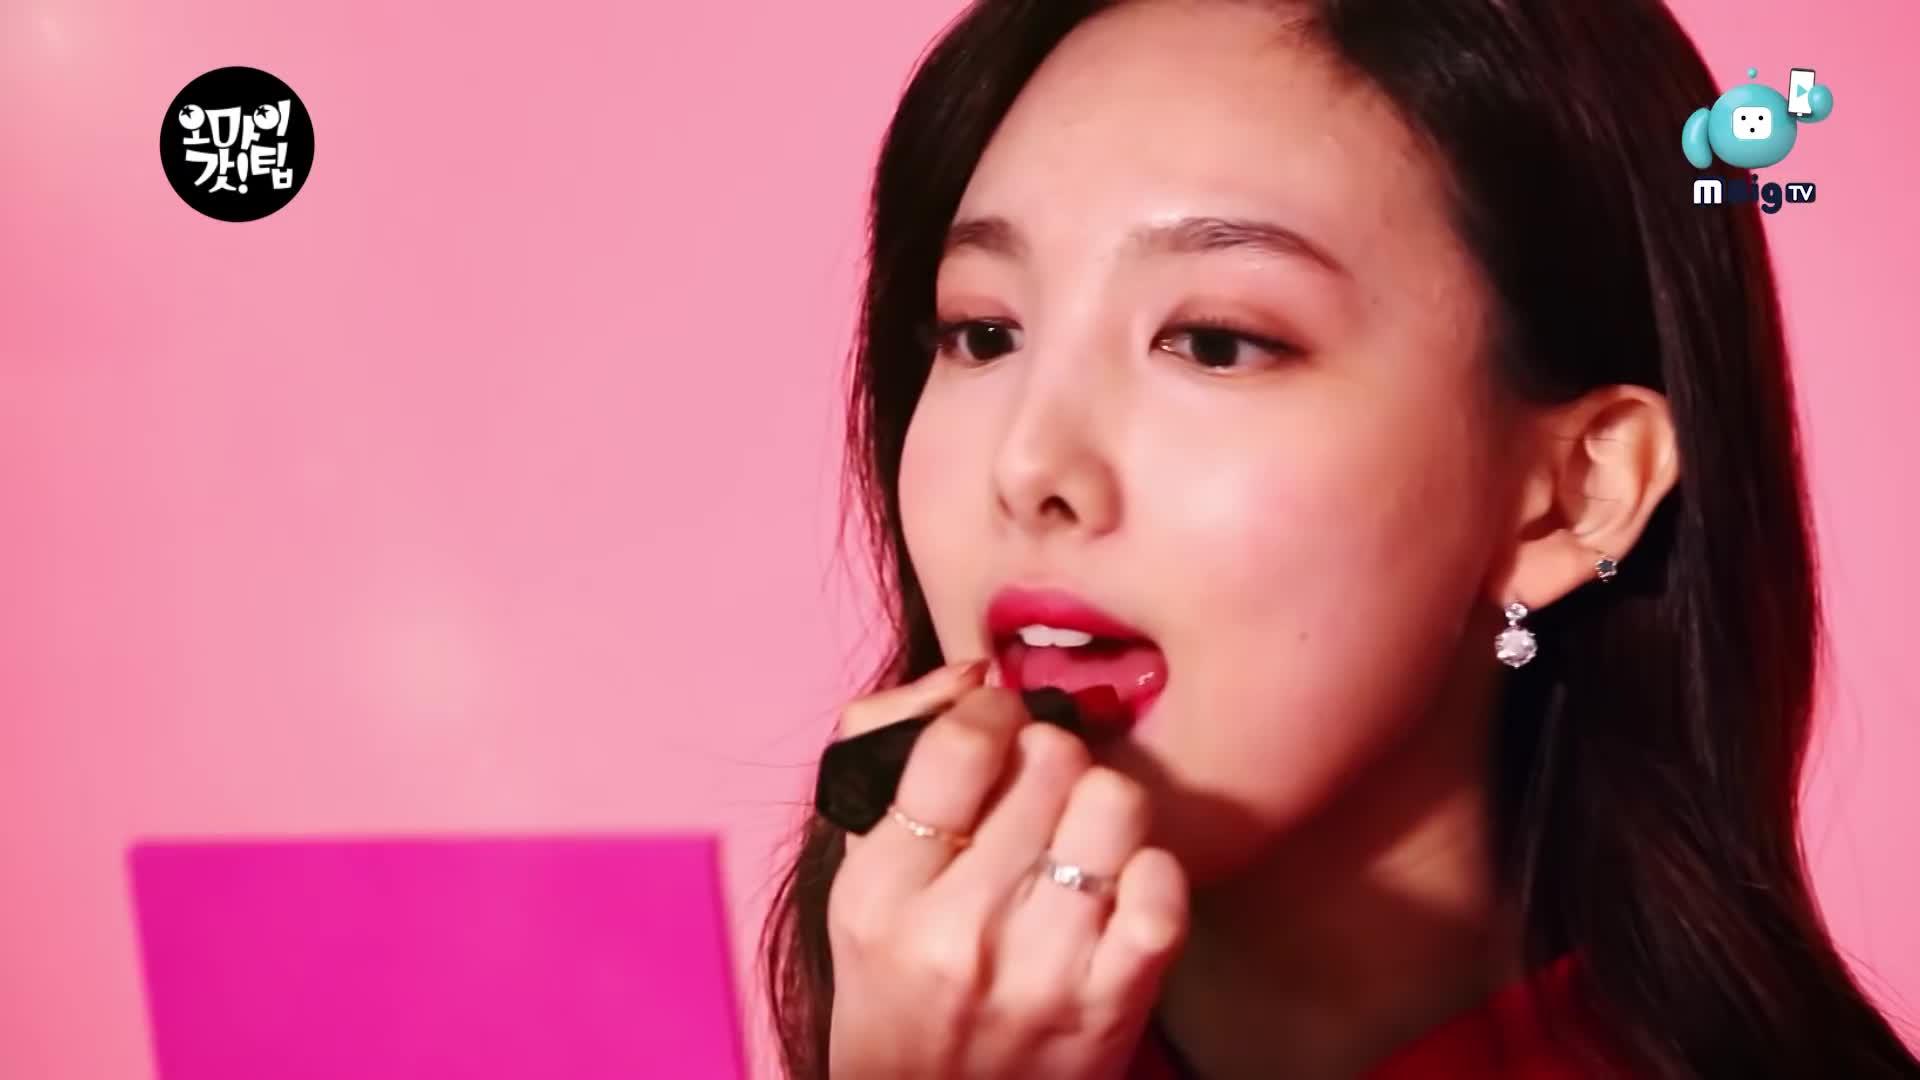 Big재미, MBigTV, Mobile, Nayeon, 모바일예능, 비투비, 앰빅TV, 앰빅티비, 엠빅TV, 엠빅티비, 트와이스, Cutie Nayeon getting ready GIFs